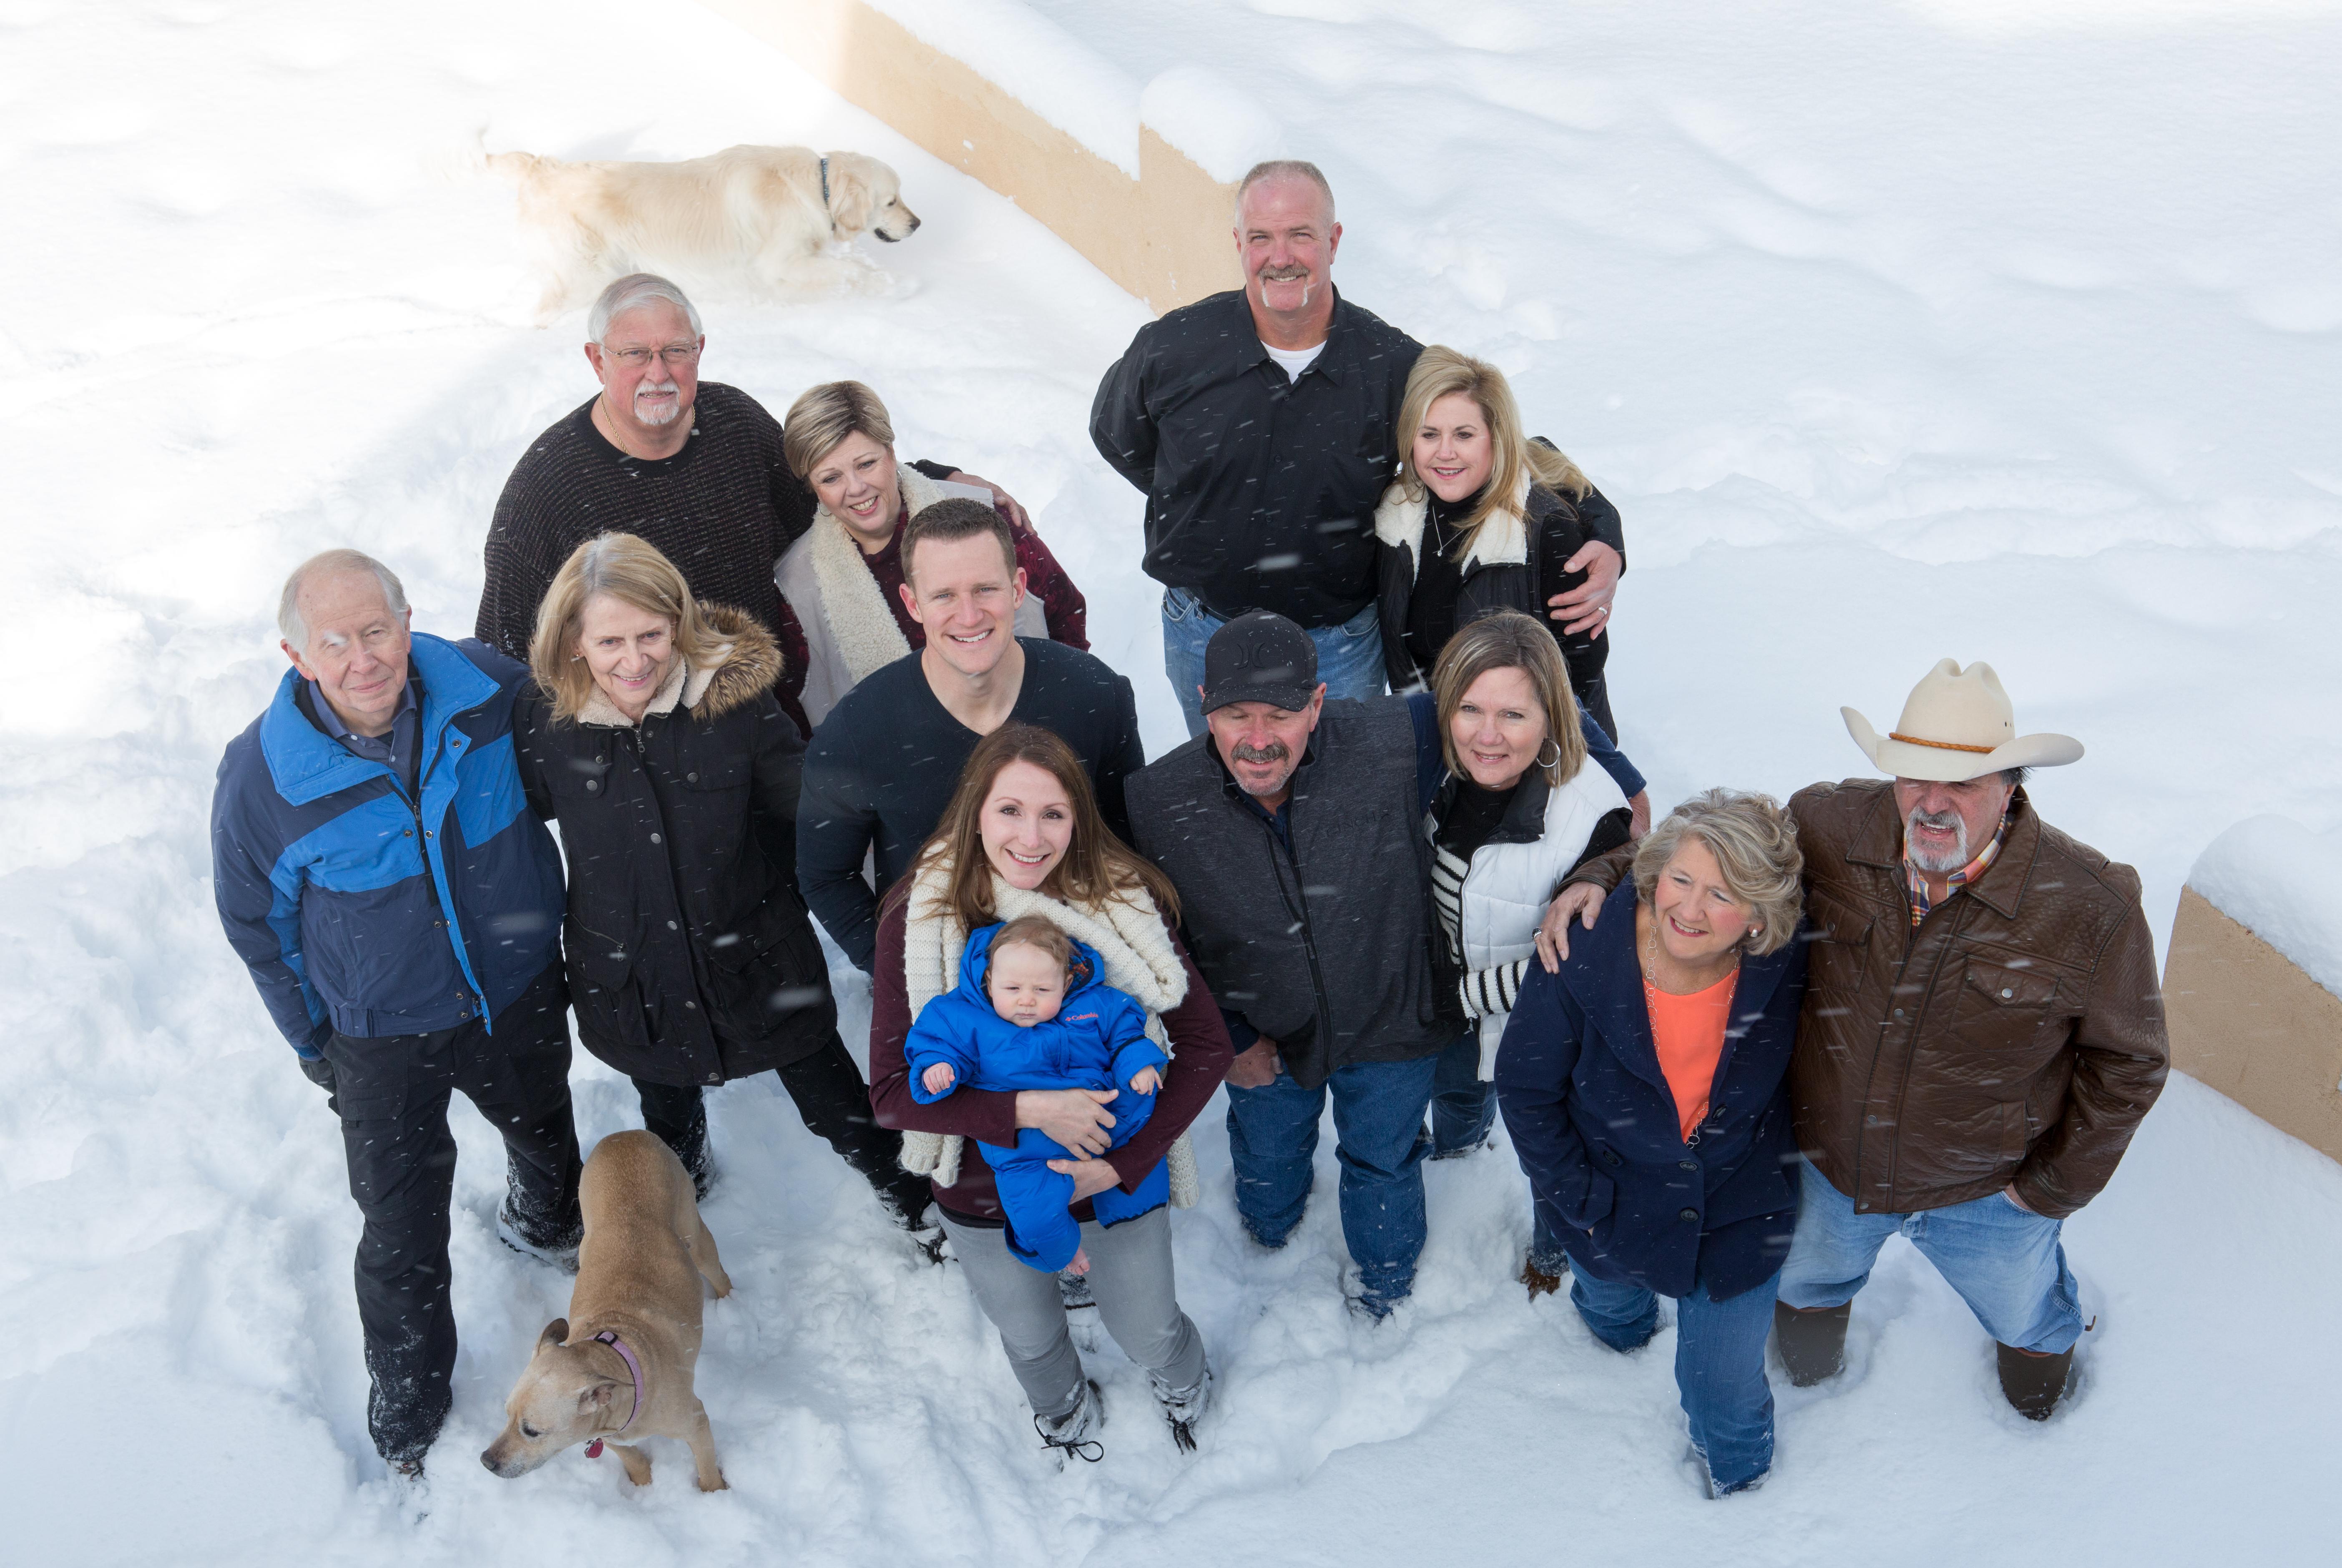 Taos Family Photography